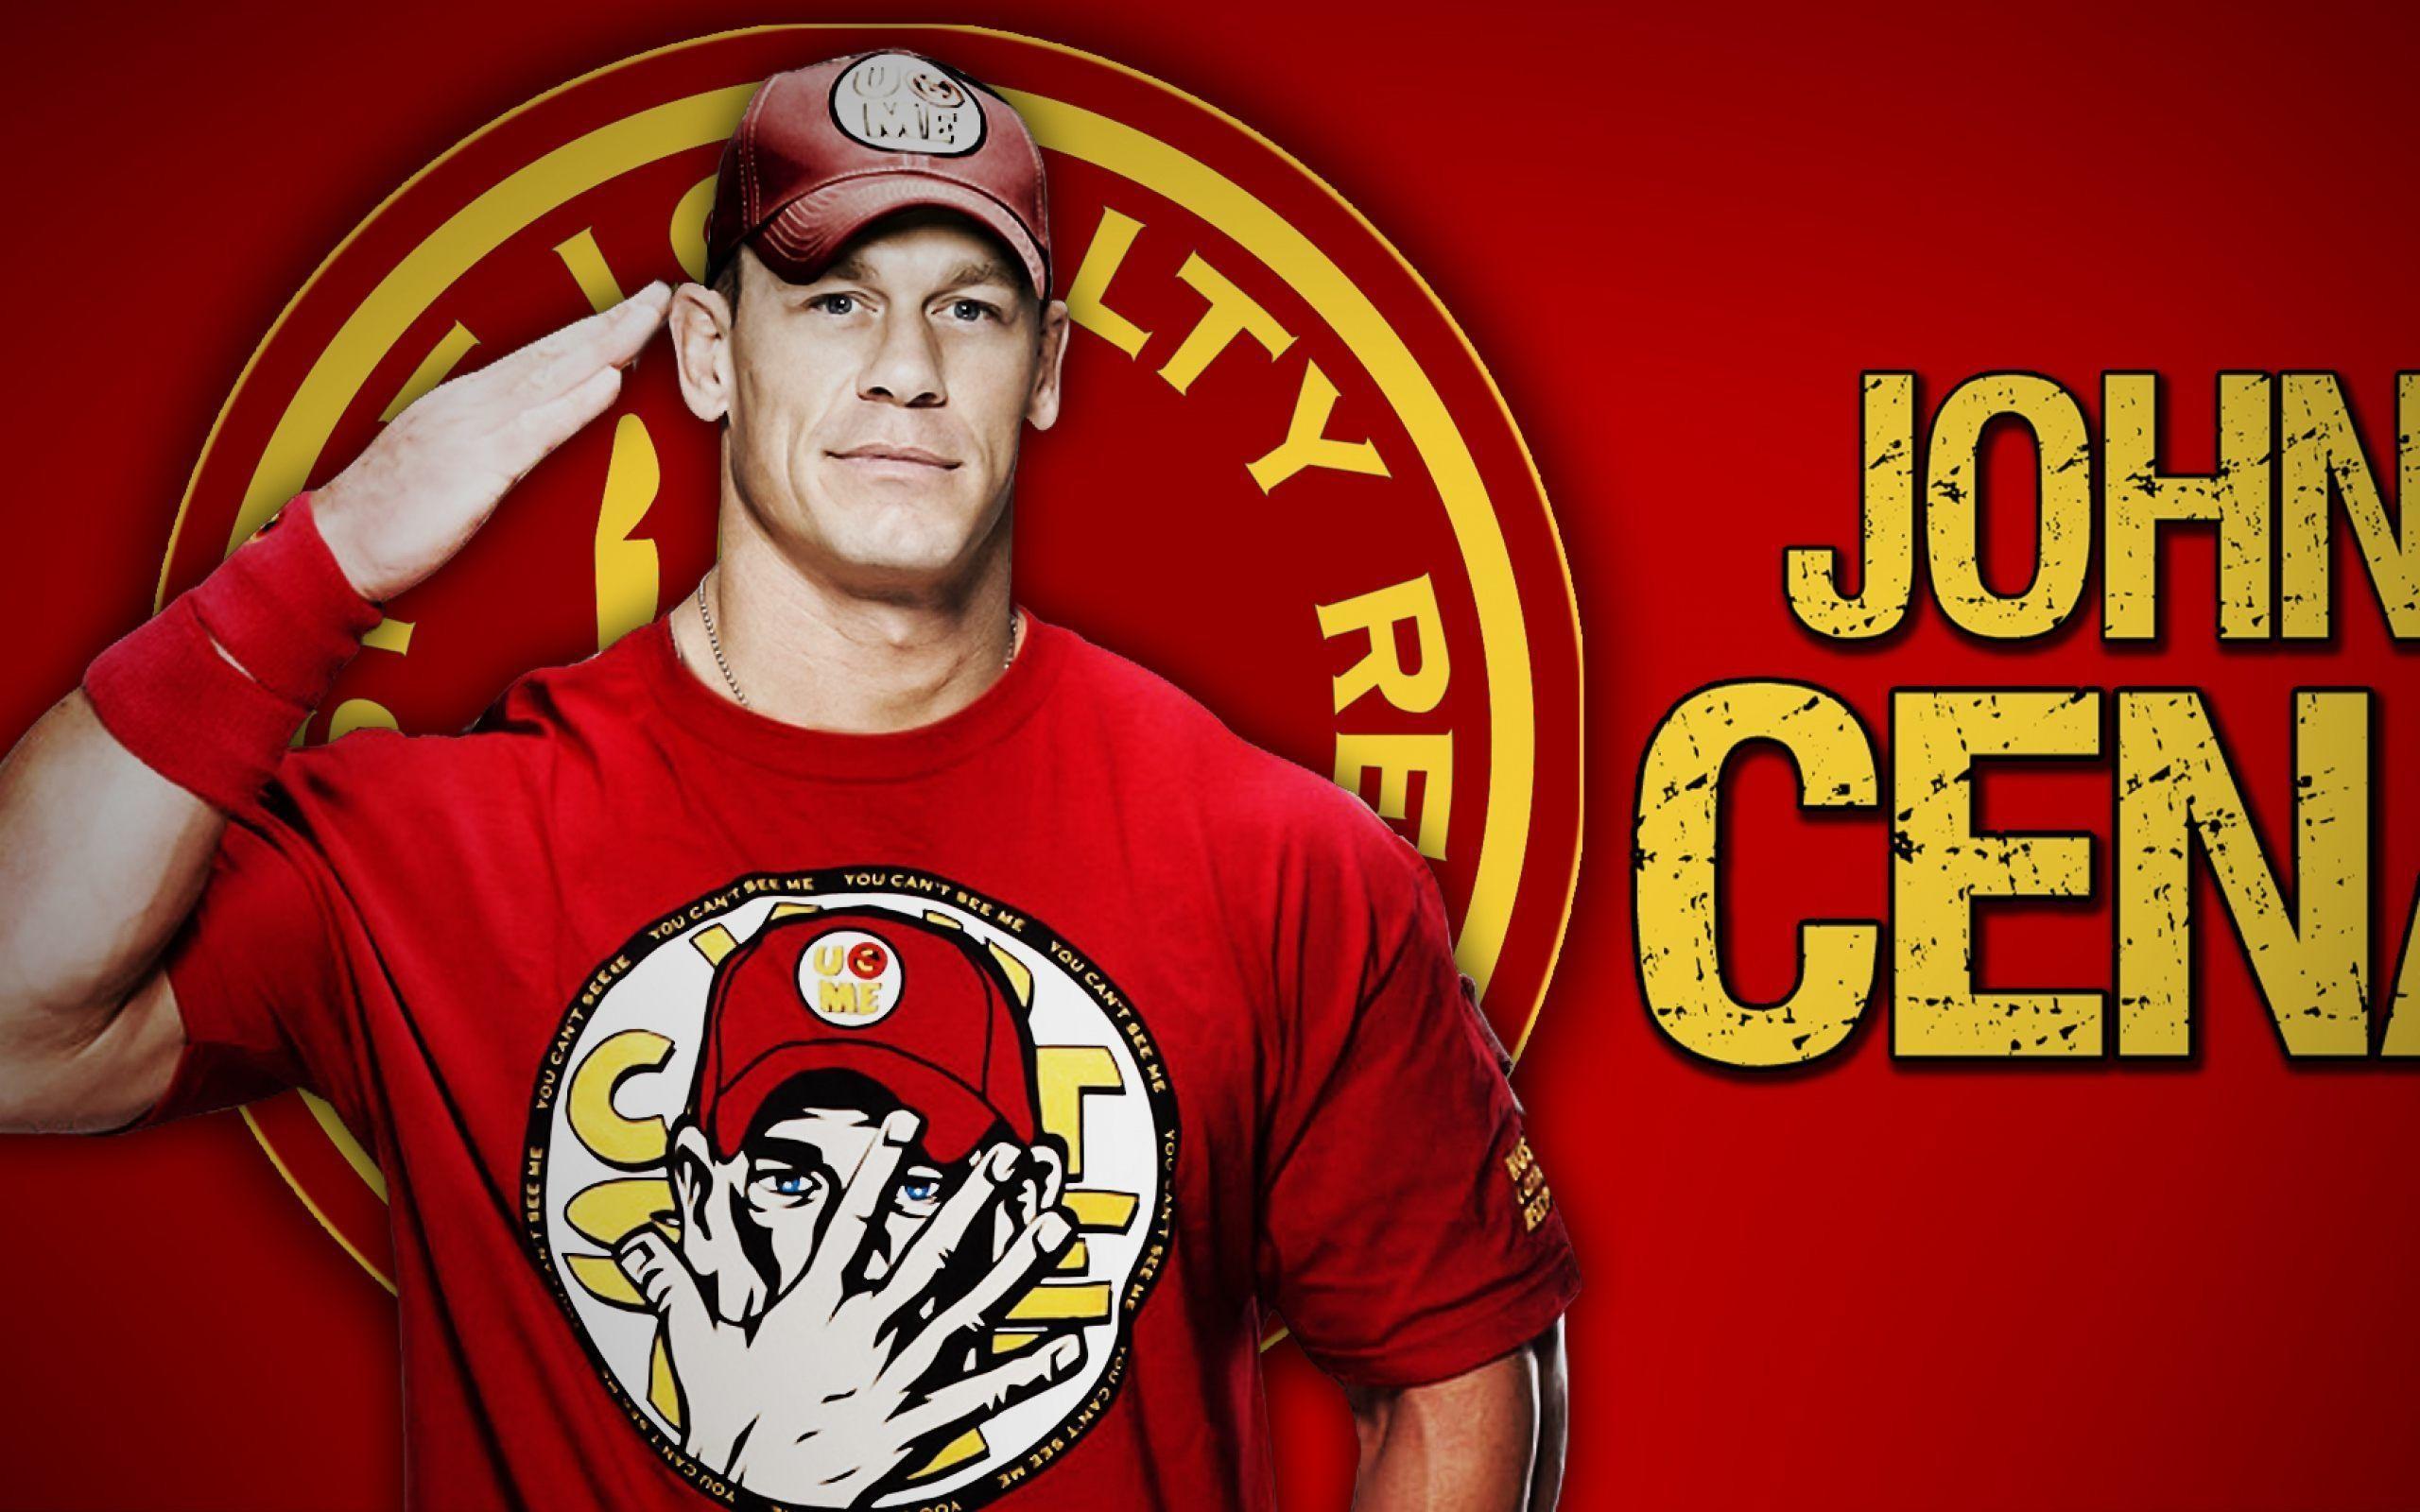 John Cena WWe Superstar Wallpaper HD Download